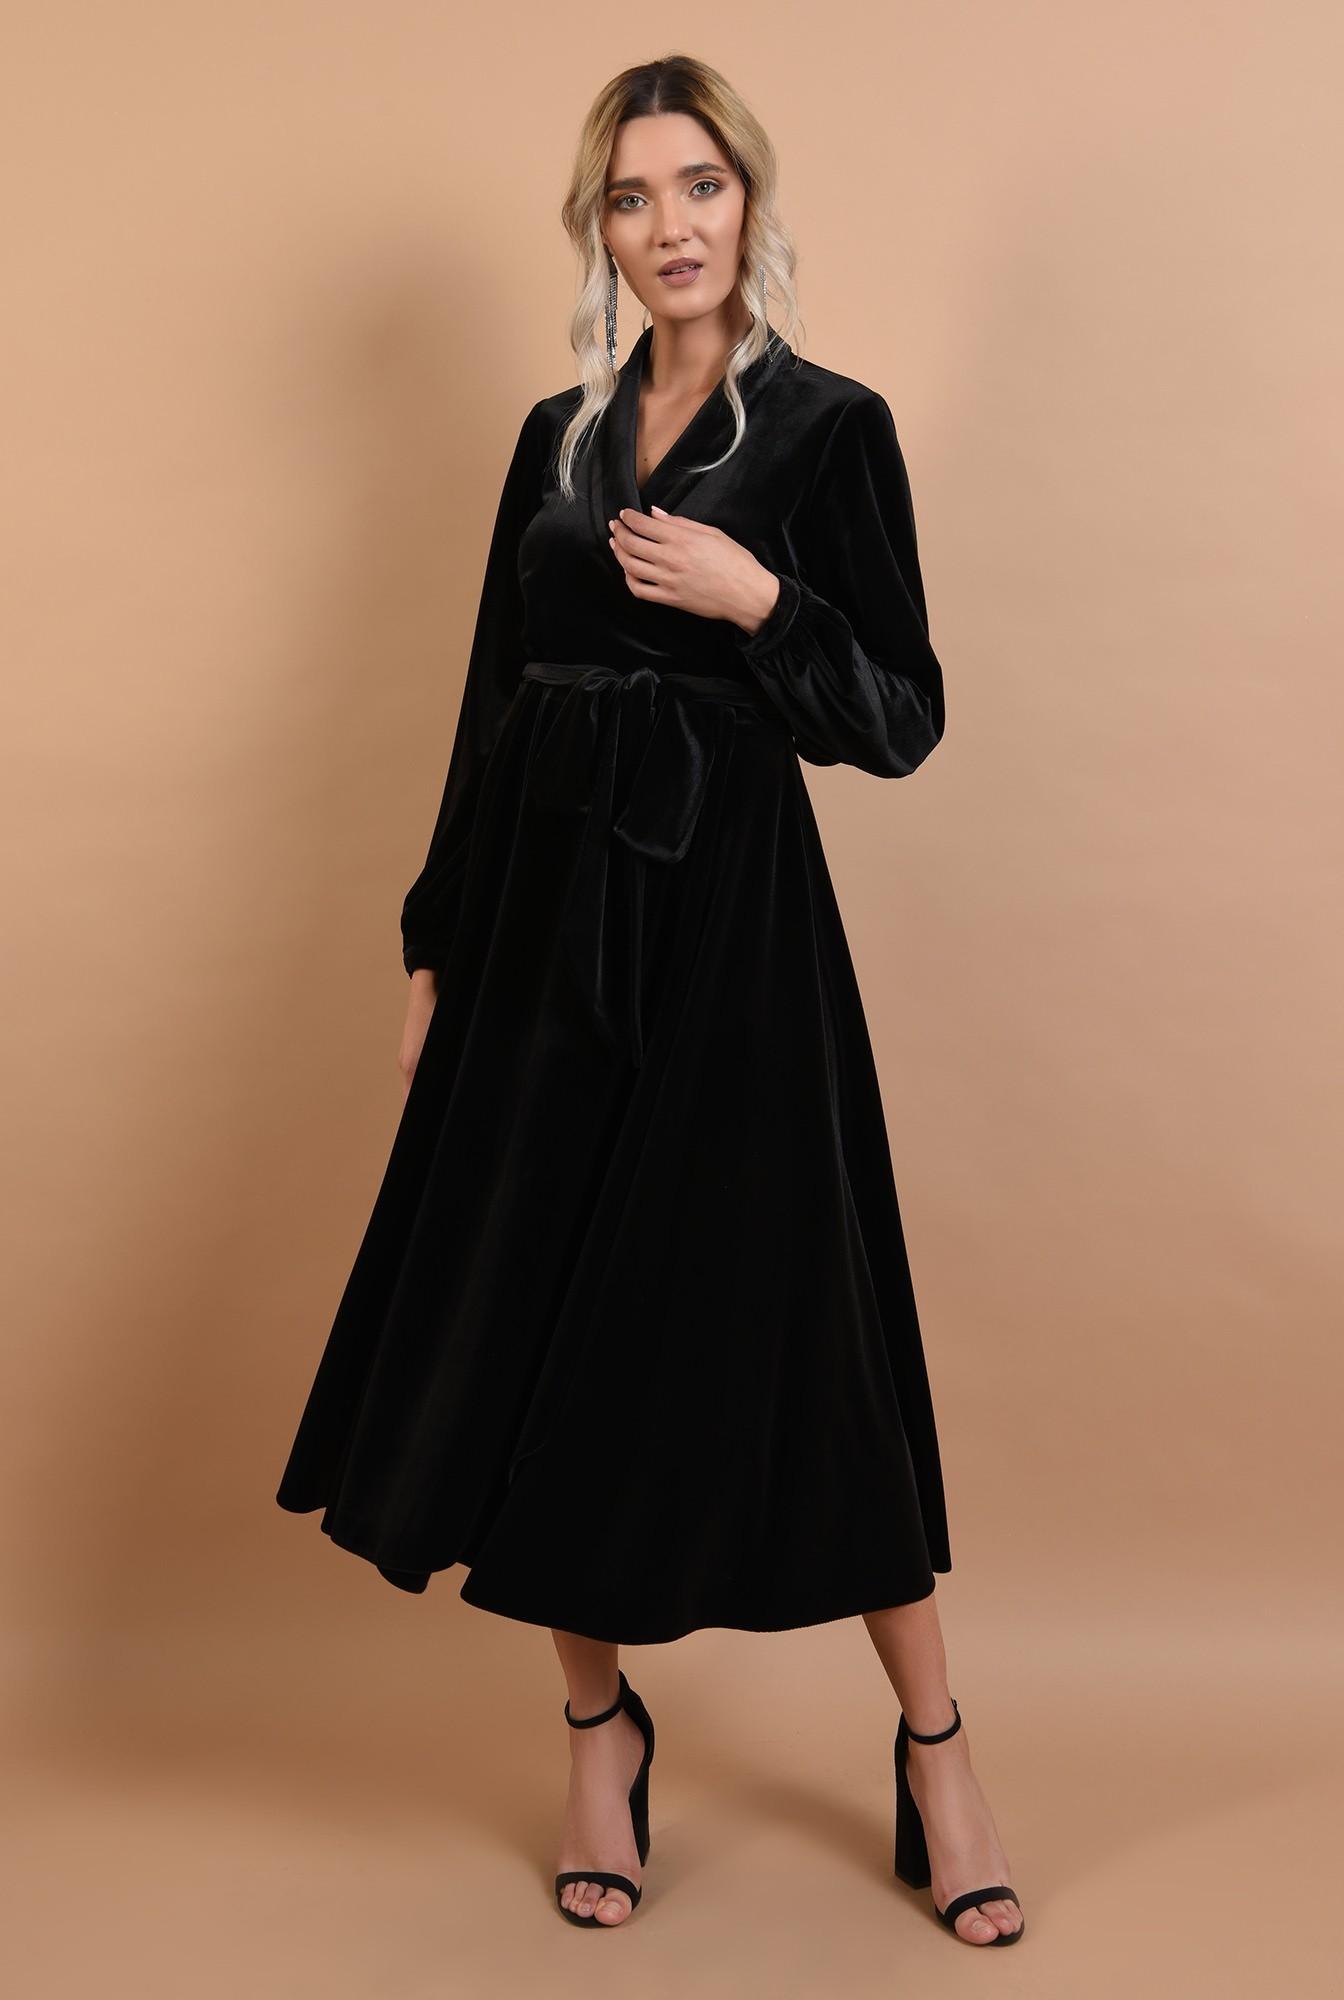 3 - 360 - rochie eleganta, midi, evazata, cu cordon, maneci lungi